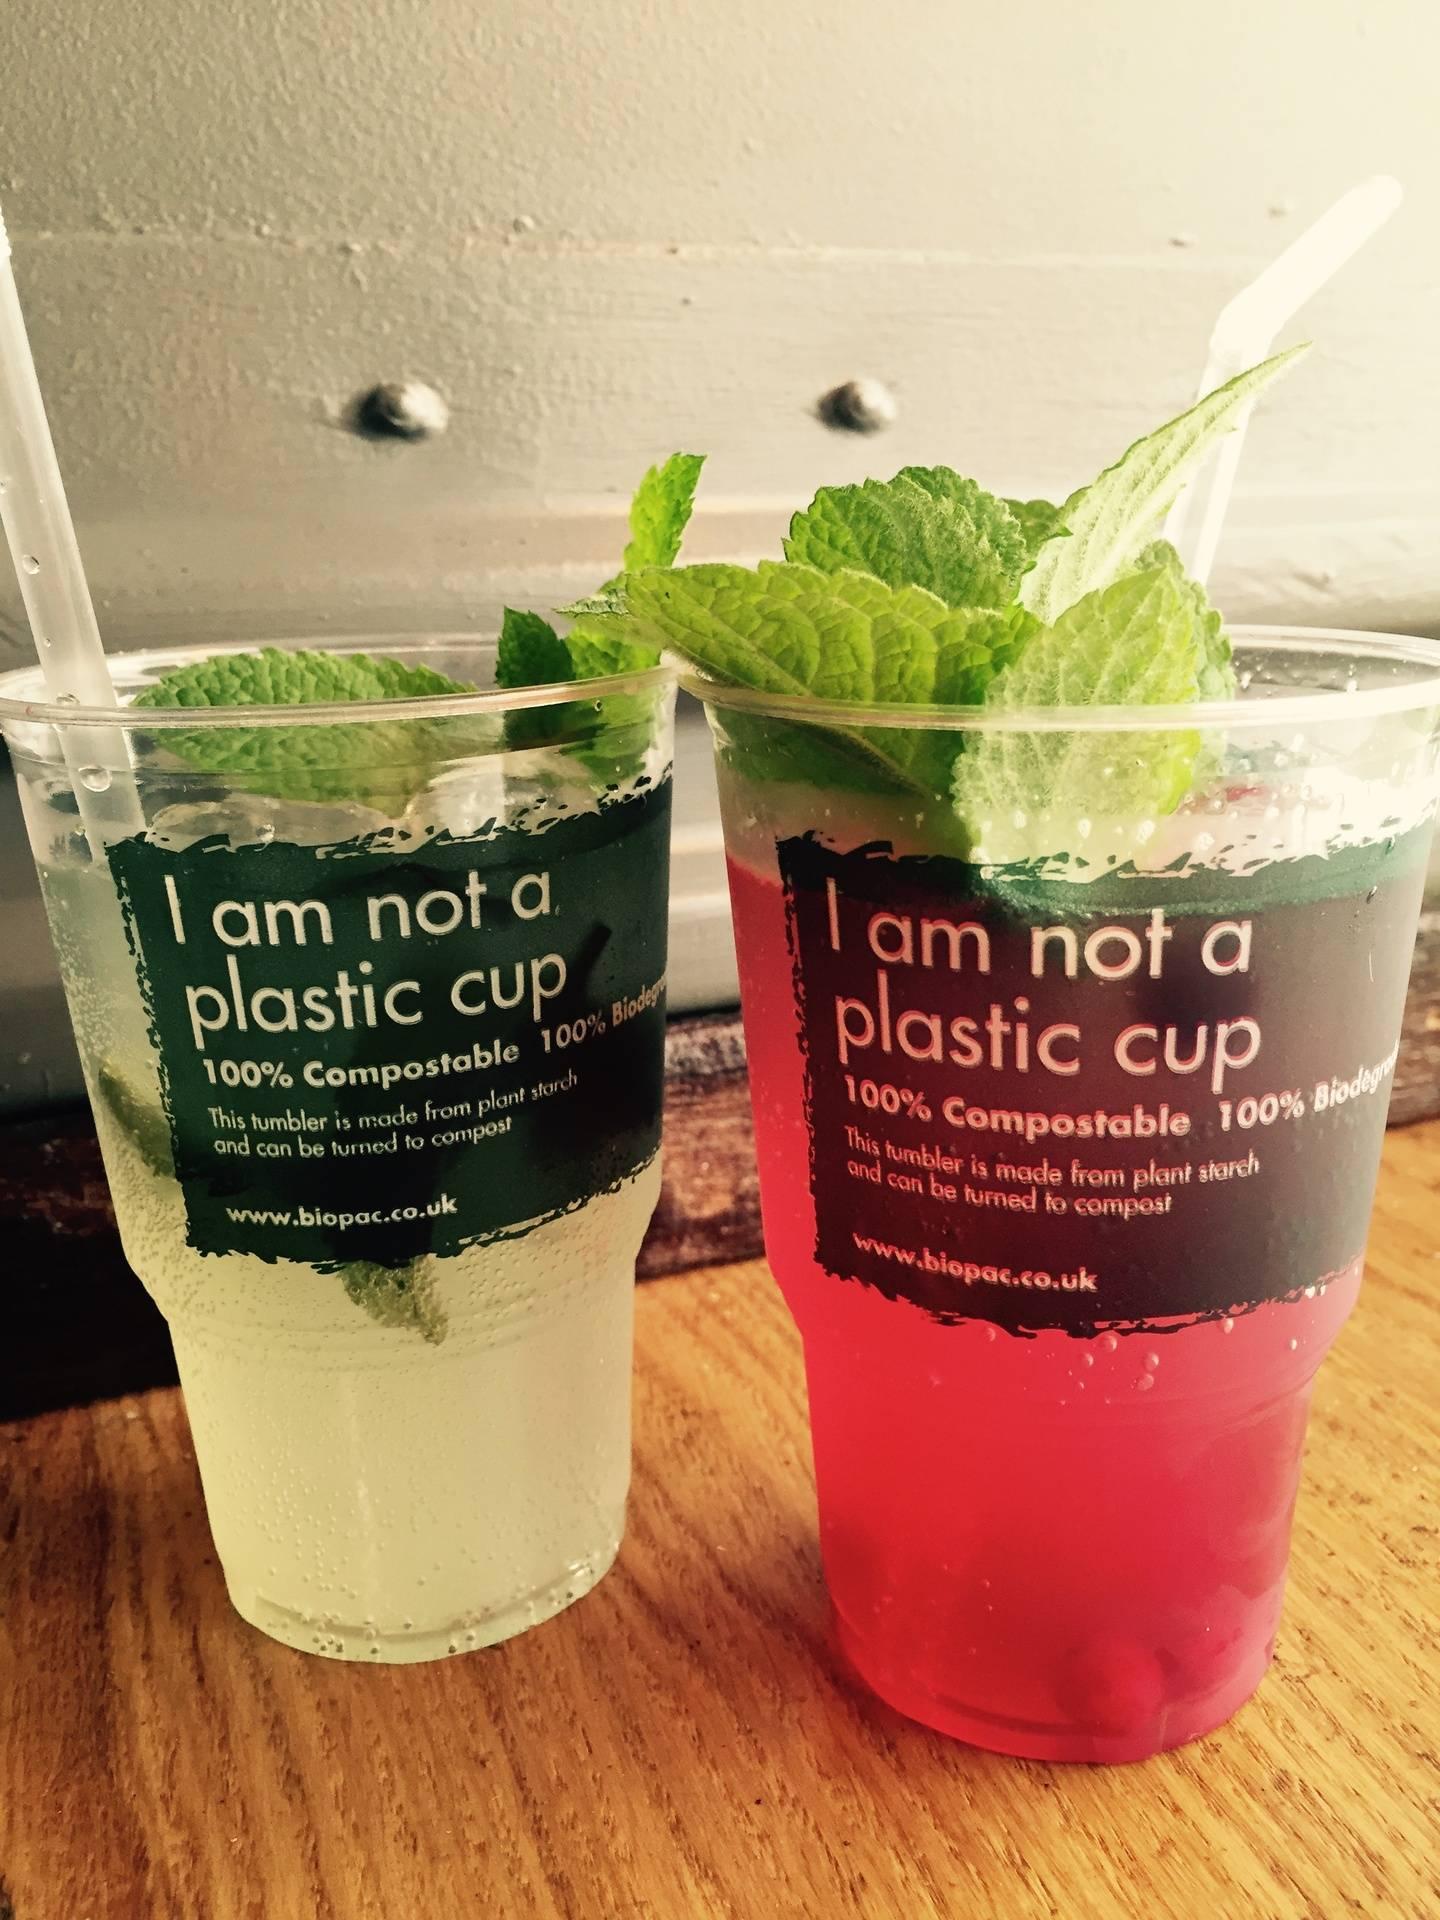 Biogradable Cups